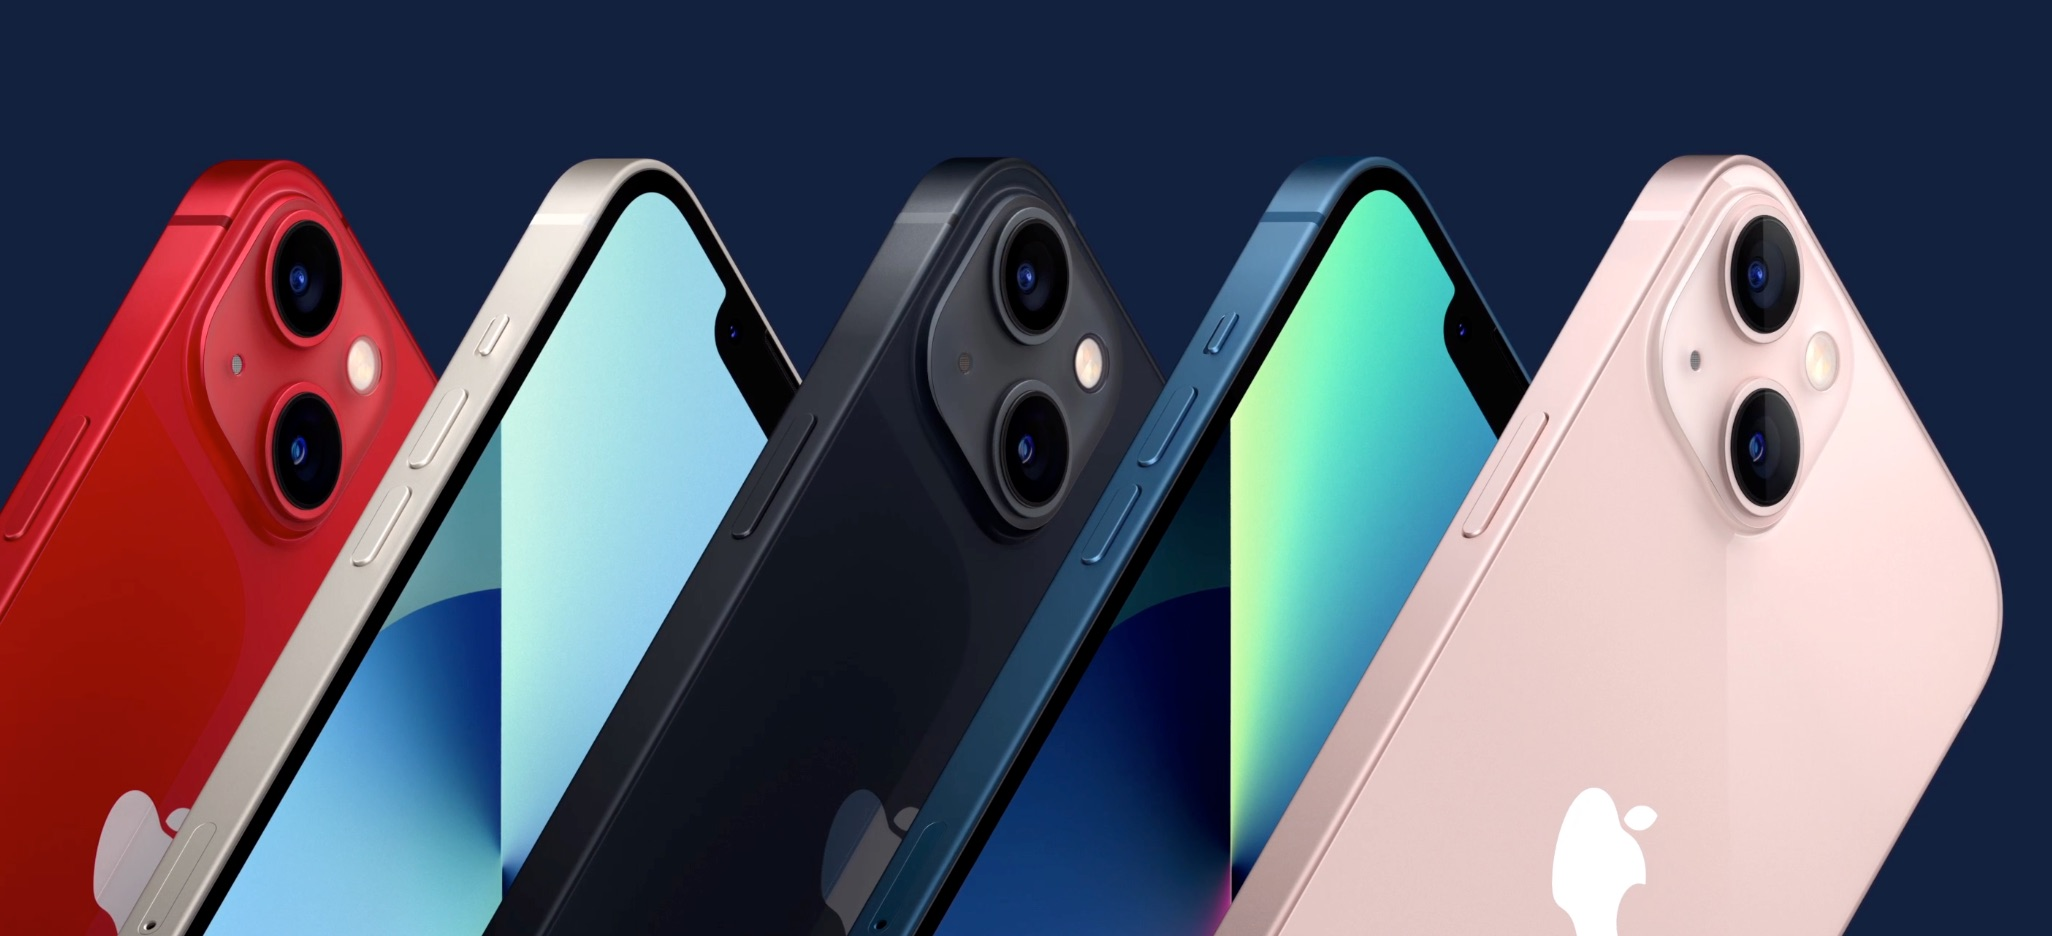 Colores del iPhone 13